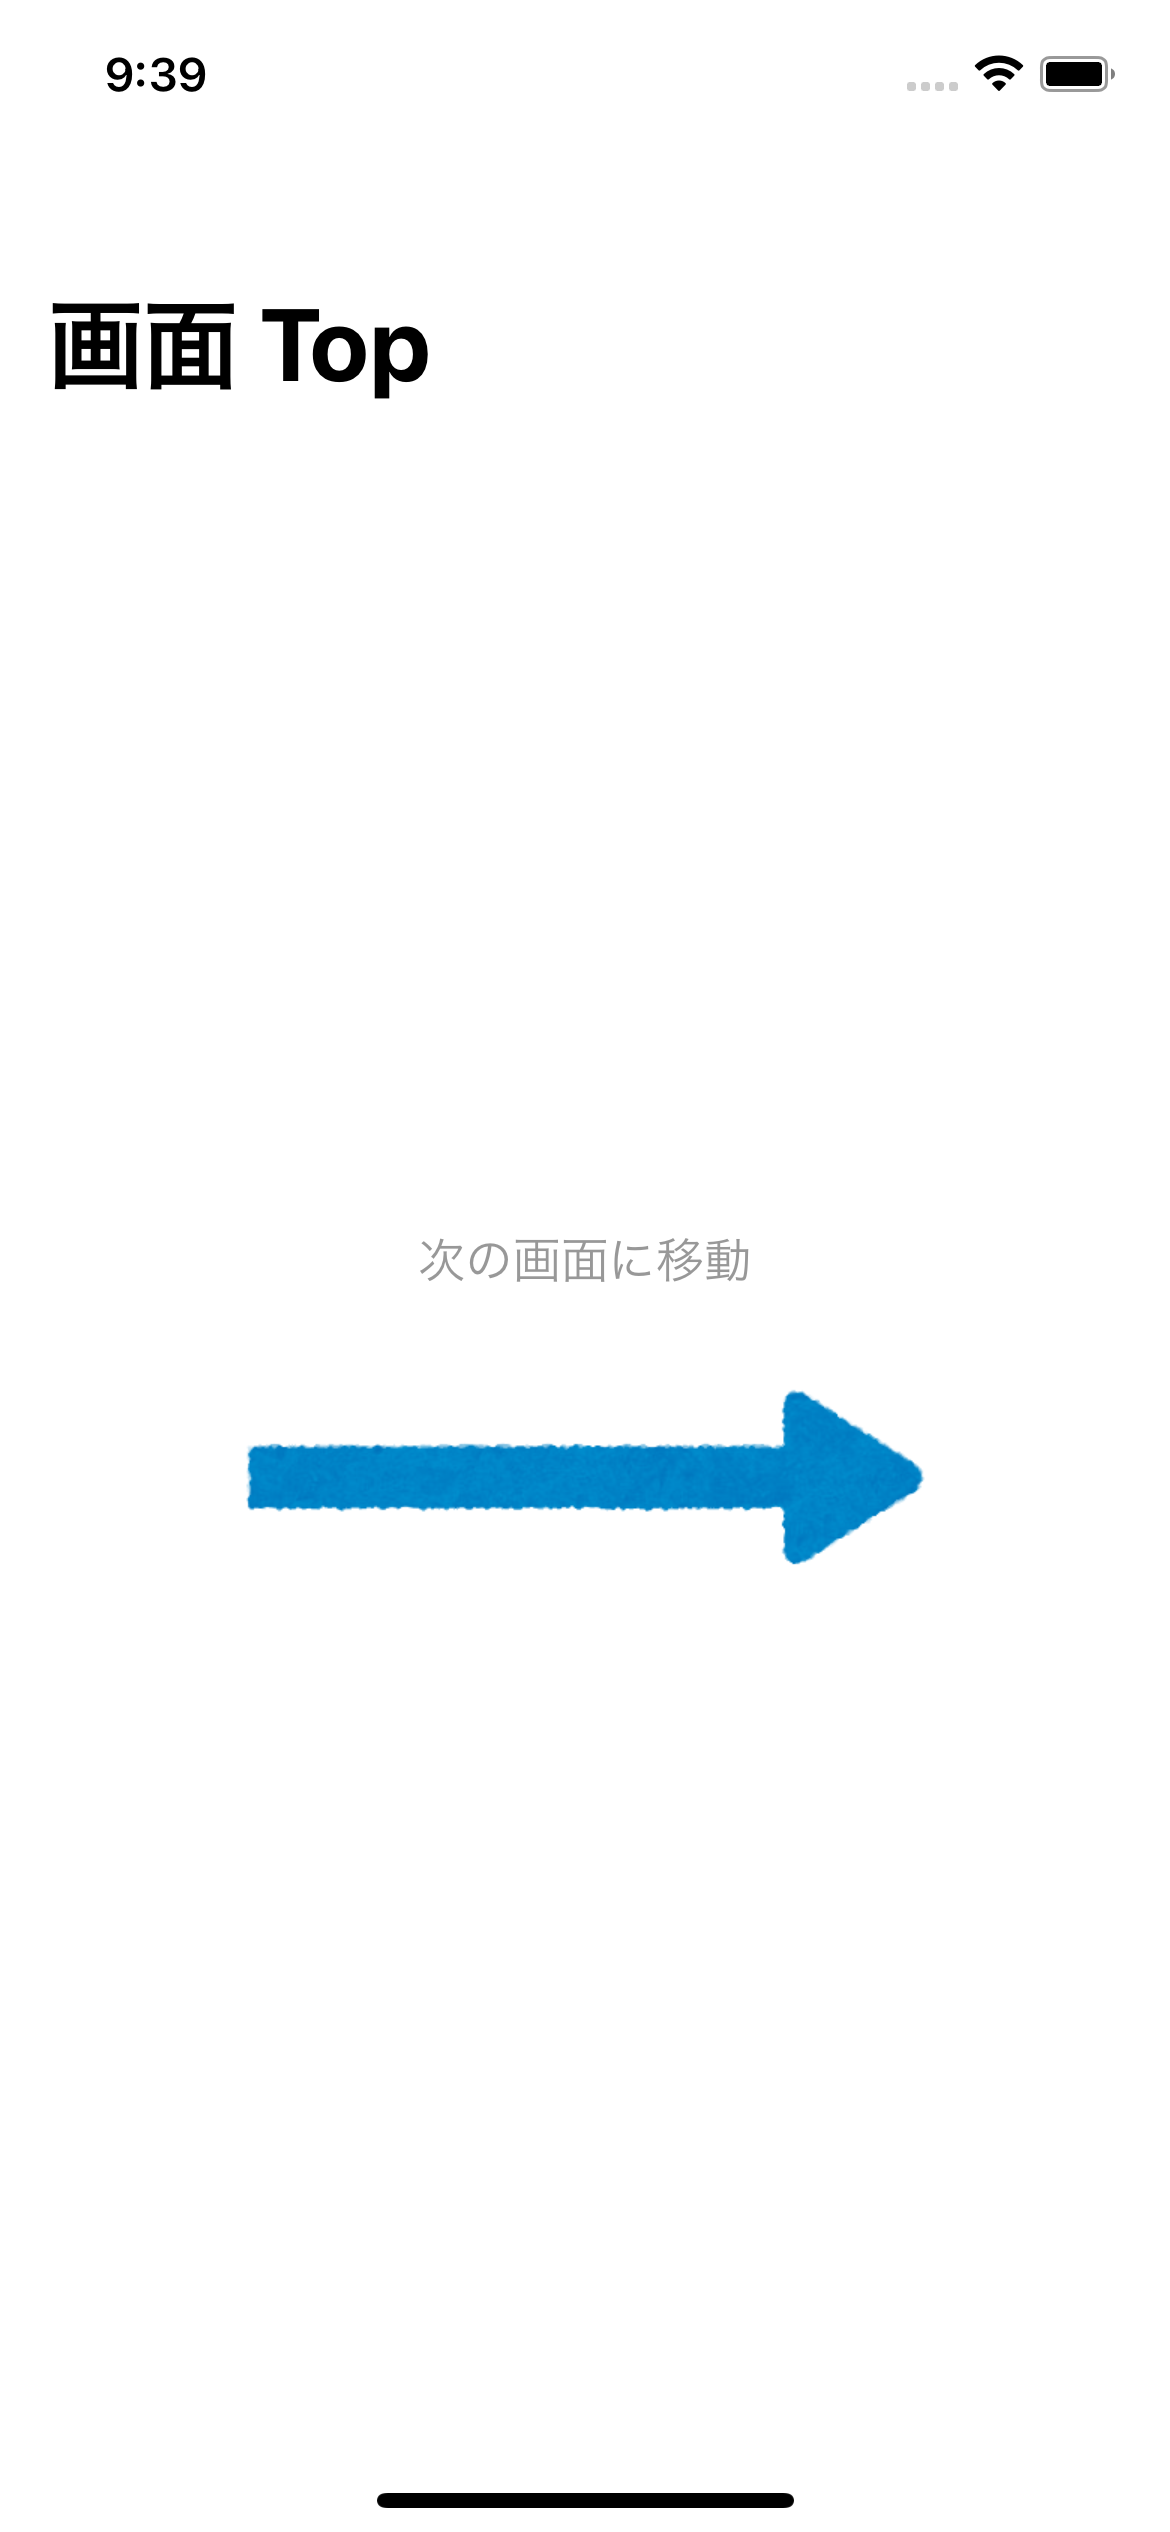 NavigationLink の有効/無効を切り替える例